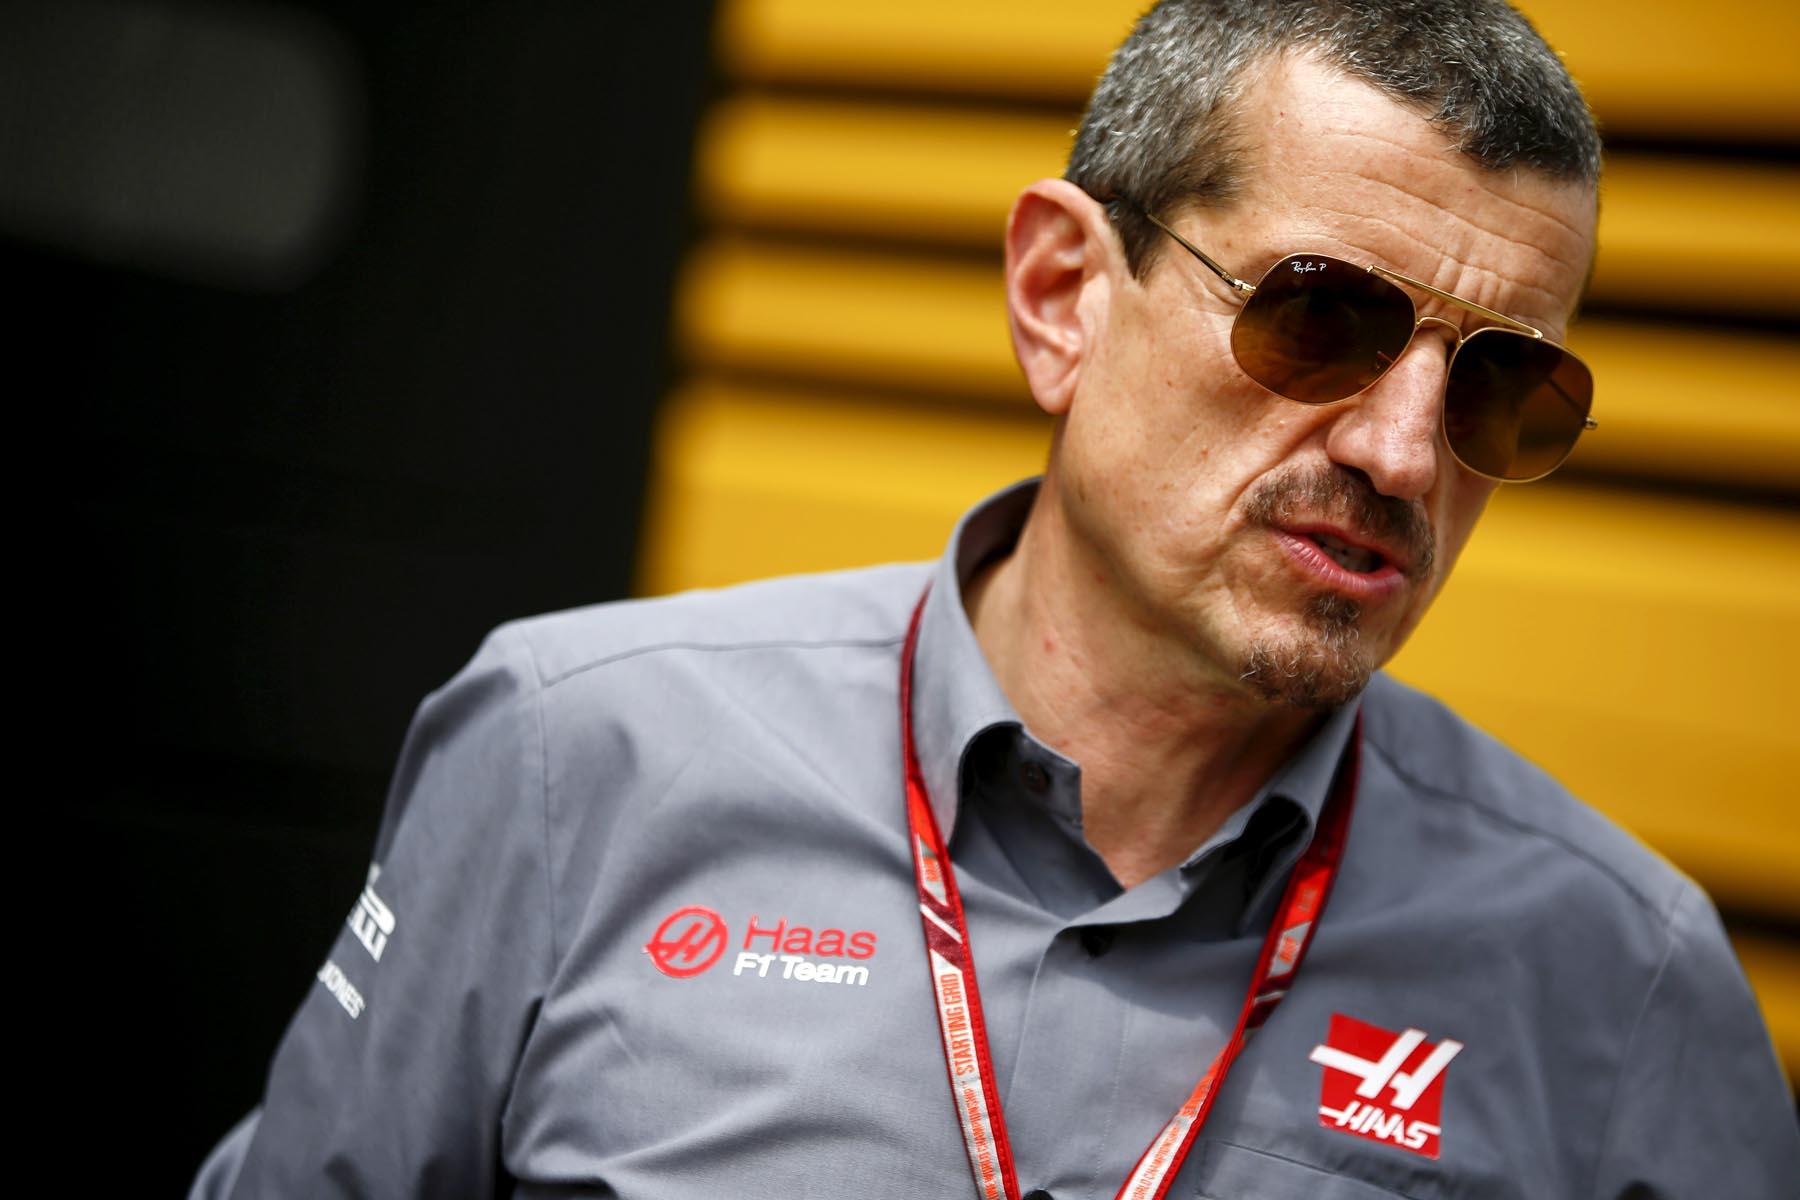 Haas principal Gunther Steiner